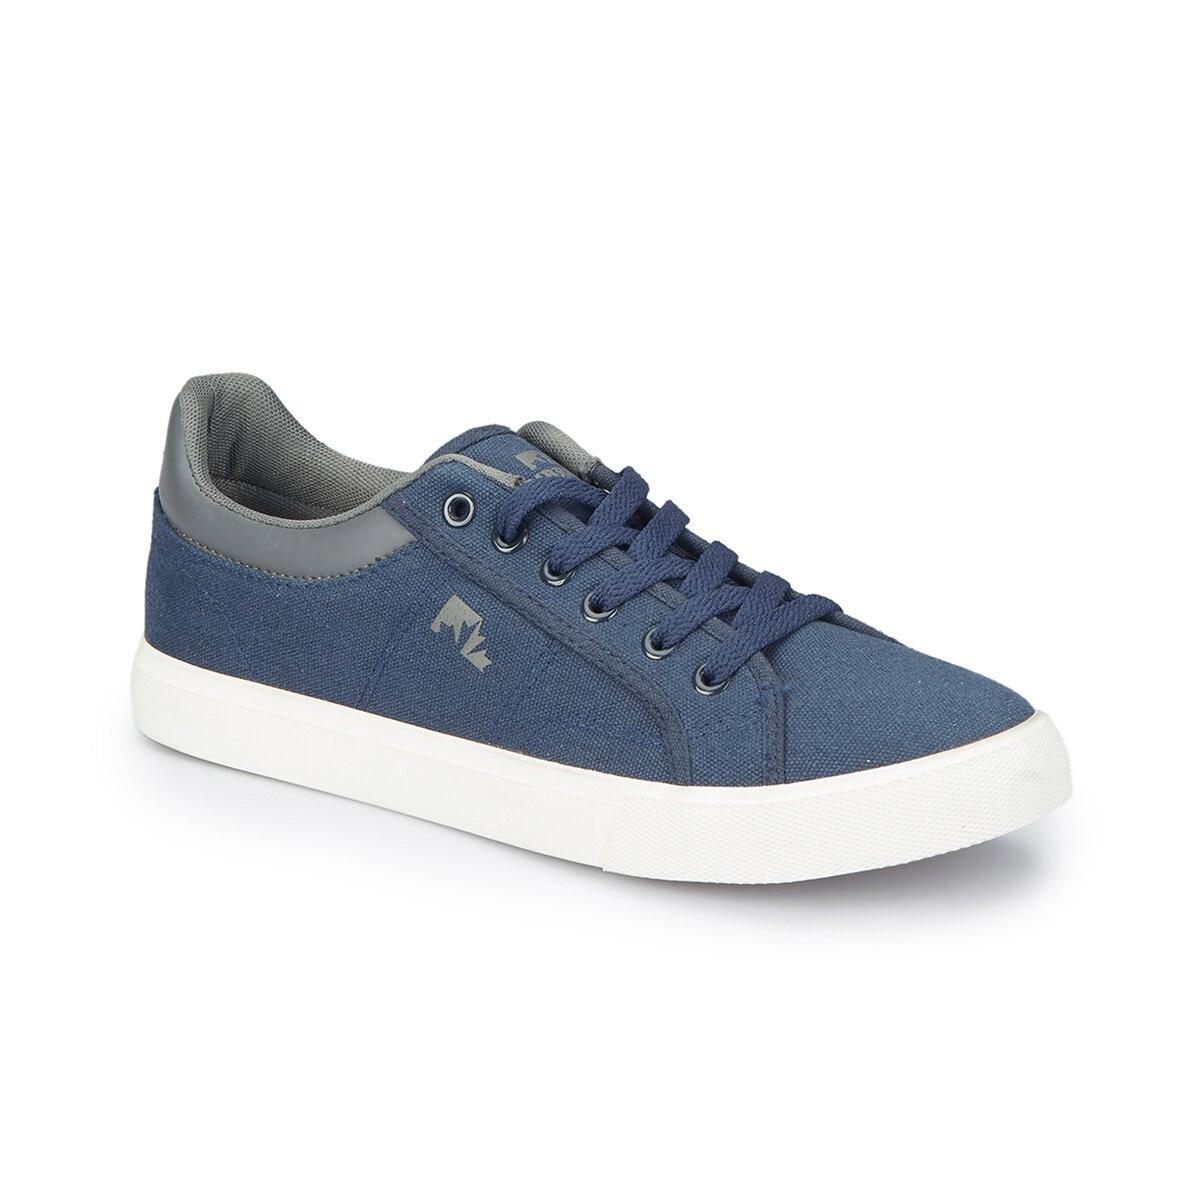 FLO PERKINS Navy Blue Men 'S Sneaker Shoes LUMBERJACK